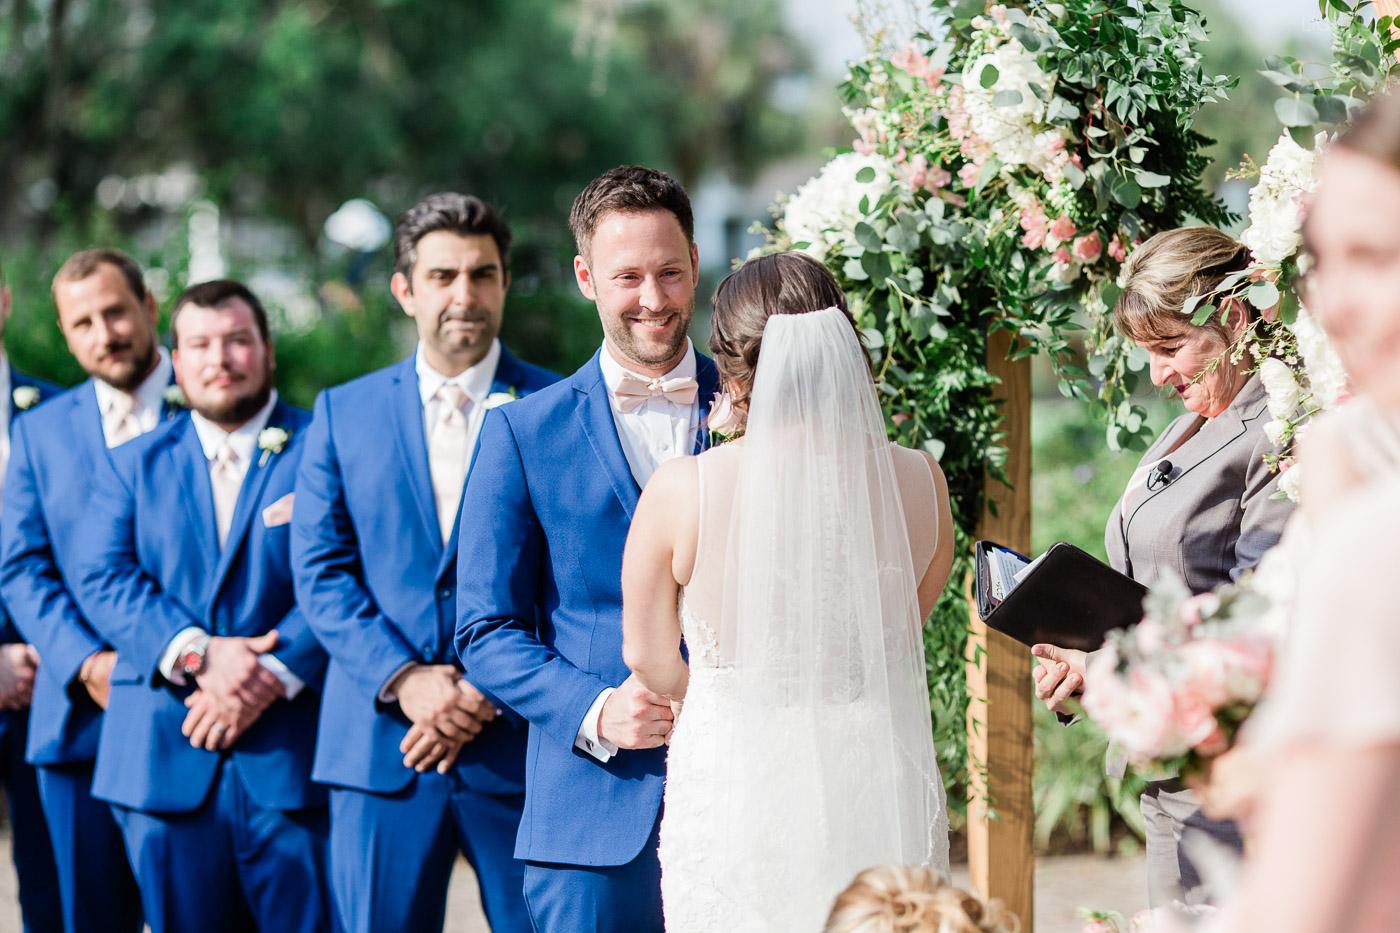 hstoric-dubsdread-wedding-orlando-10.jpg